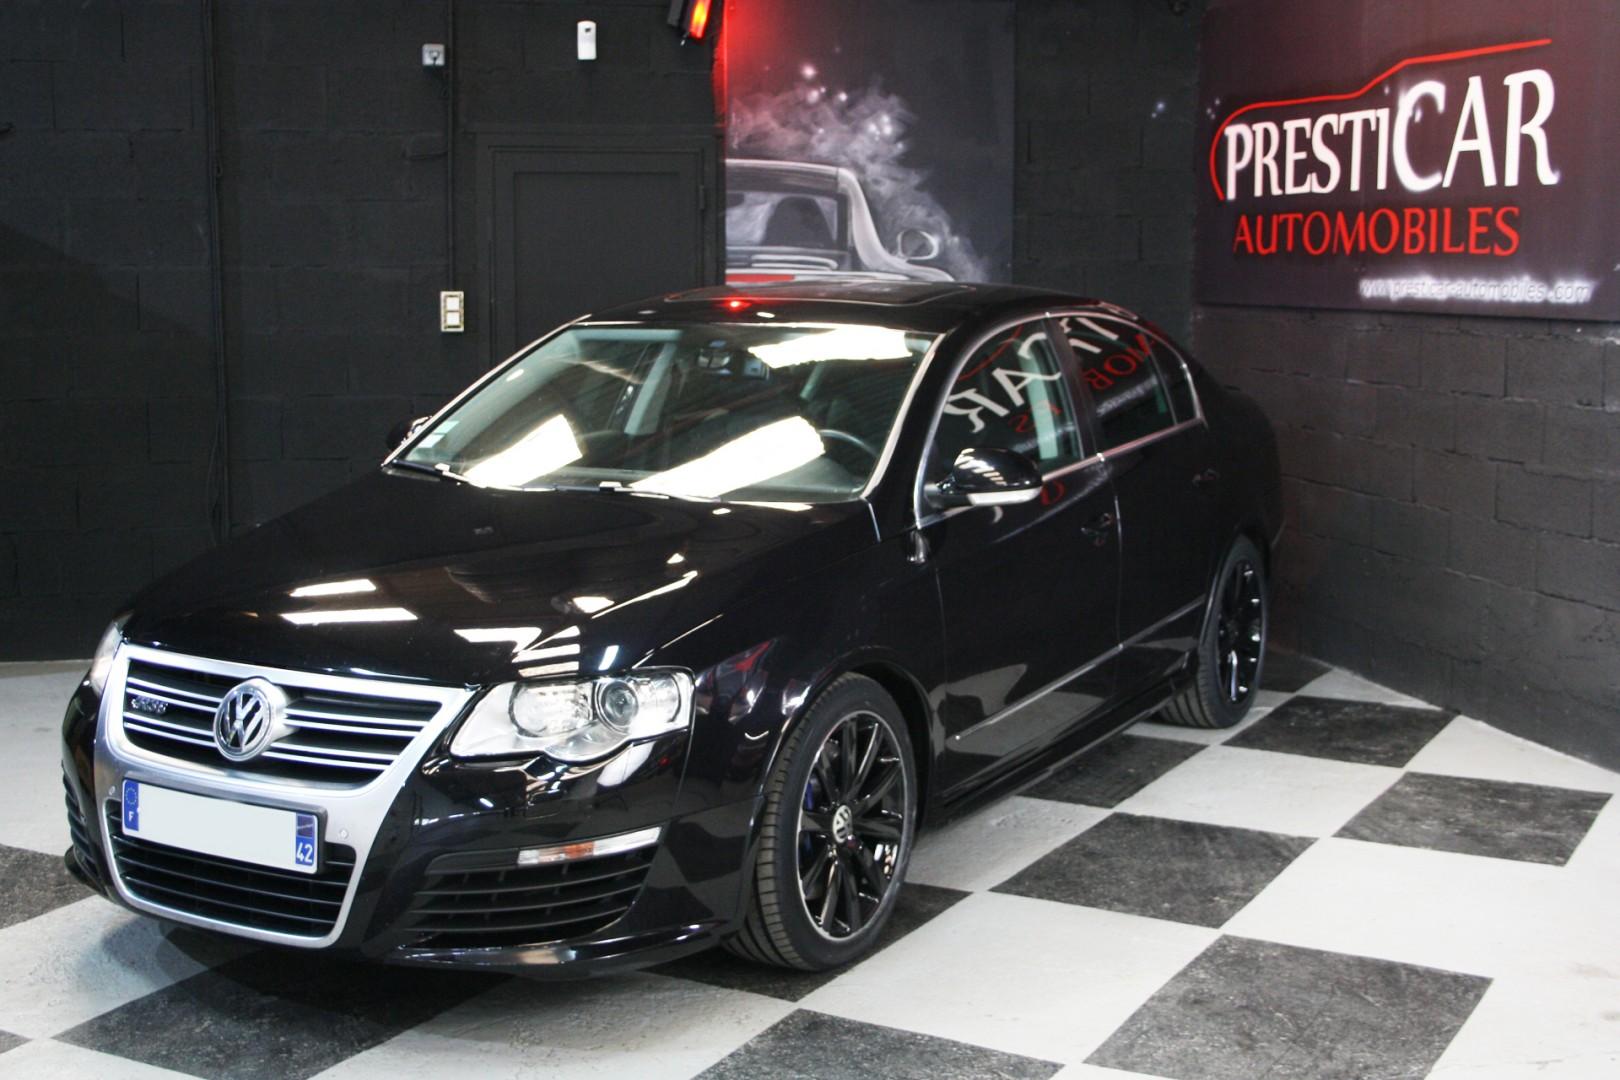 volkswagen passat 3 6 v6 fsi r36 presticar automobiles. Black Bedroom Furniture Sets. Home Design Ideas